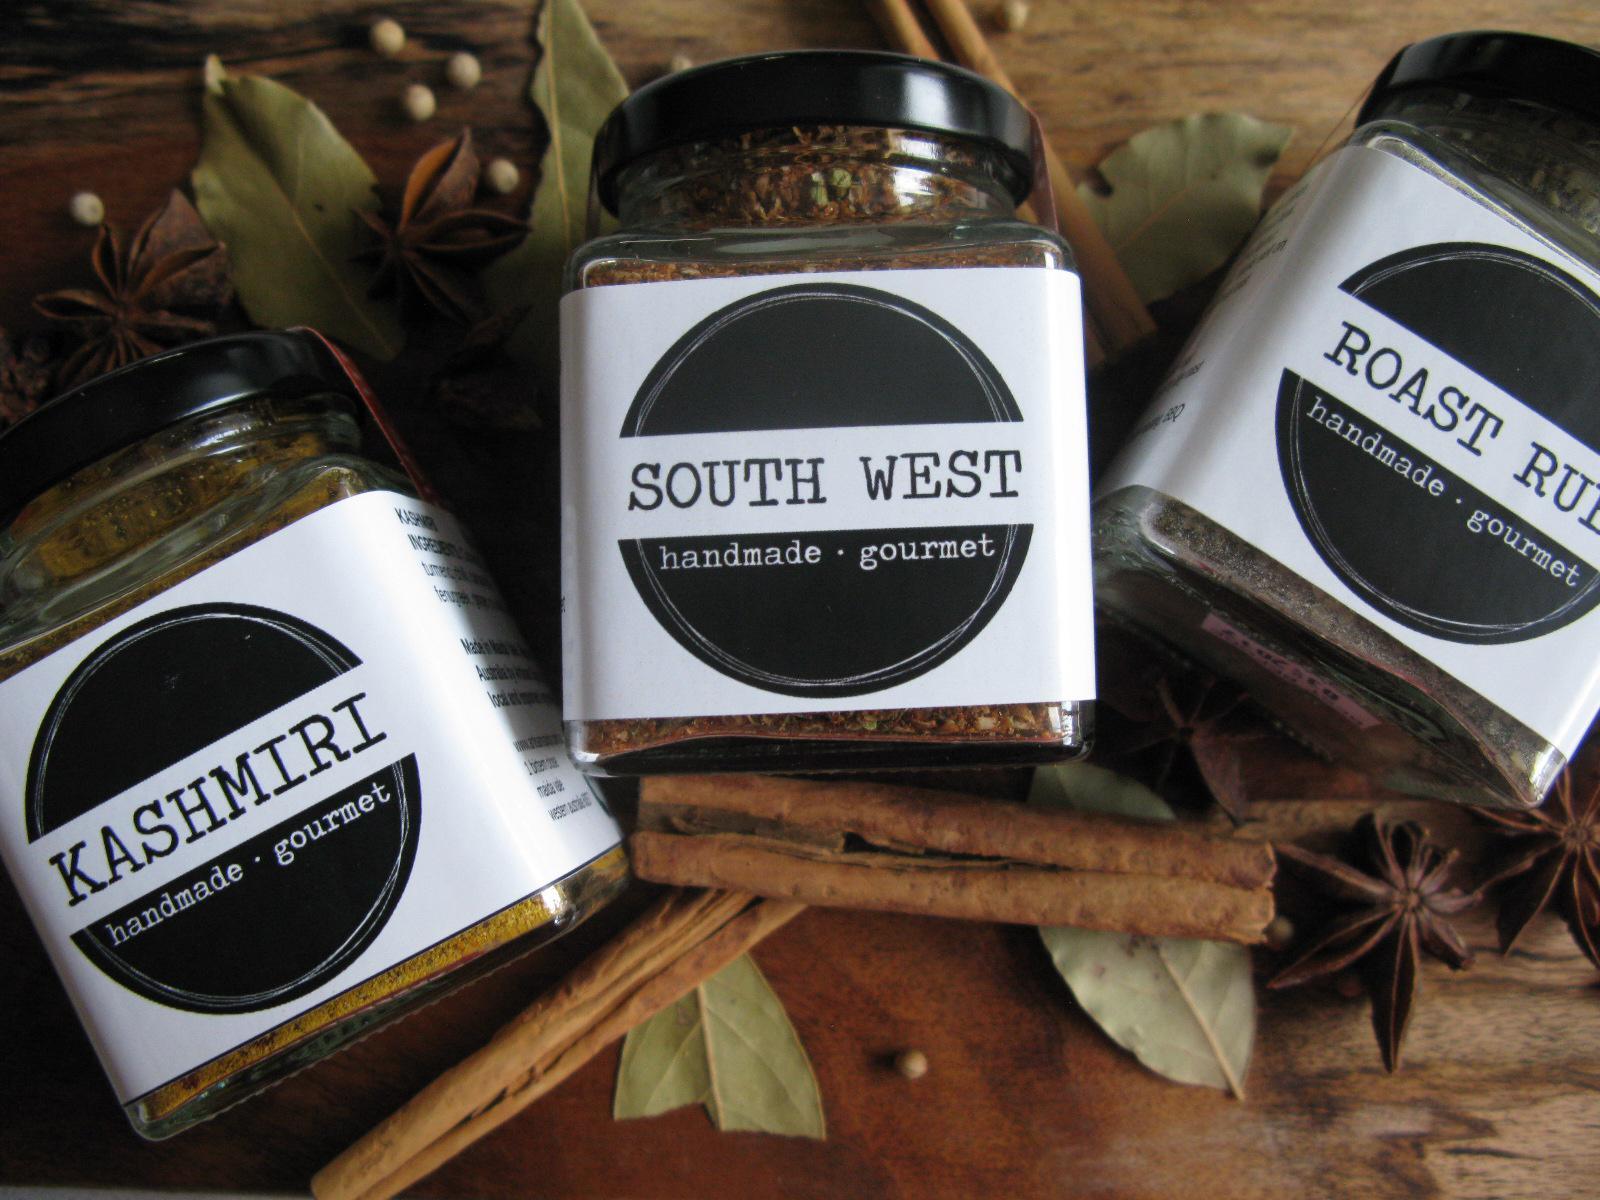 Artisan Spice spice jars